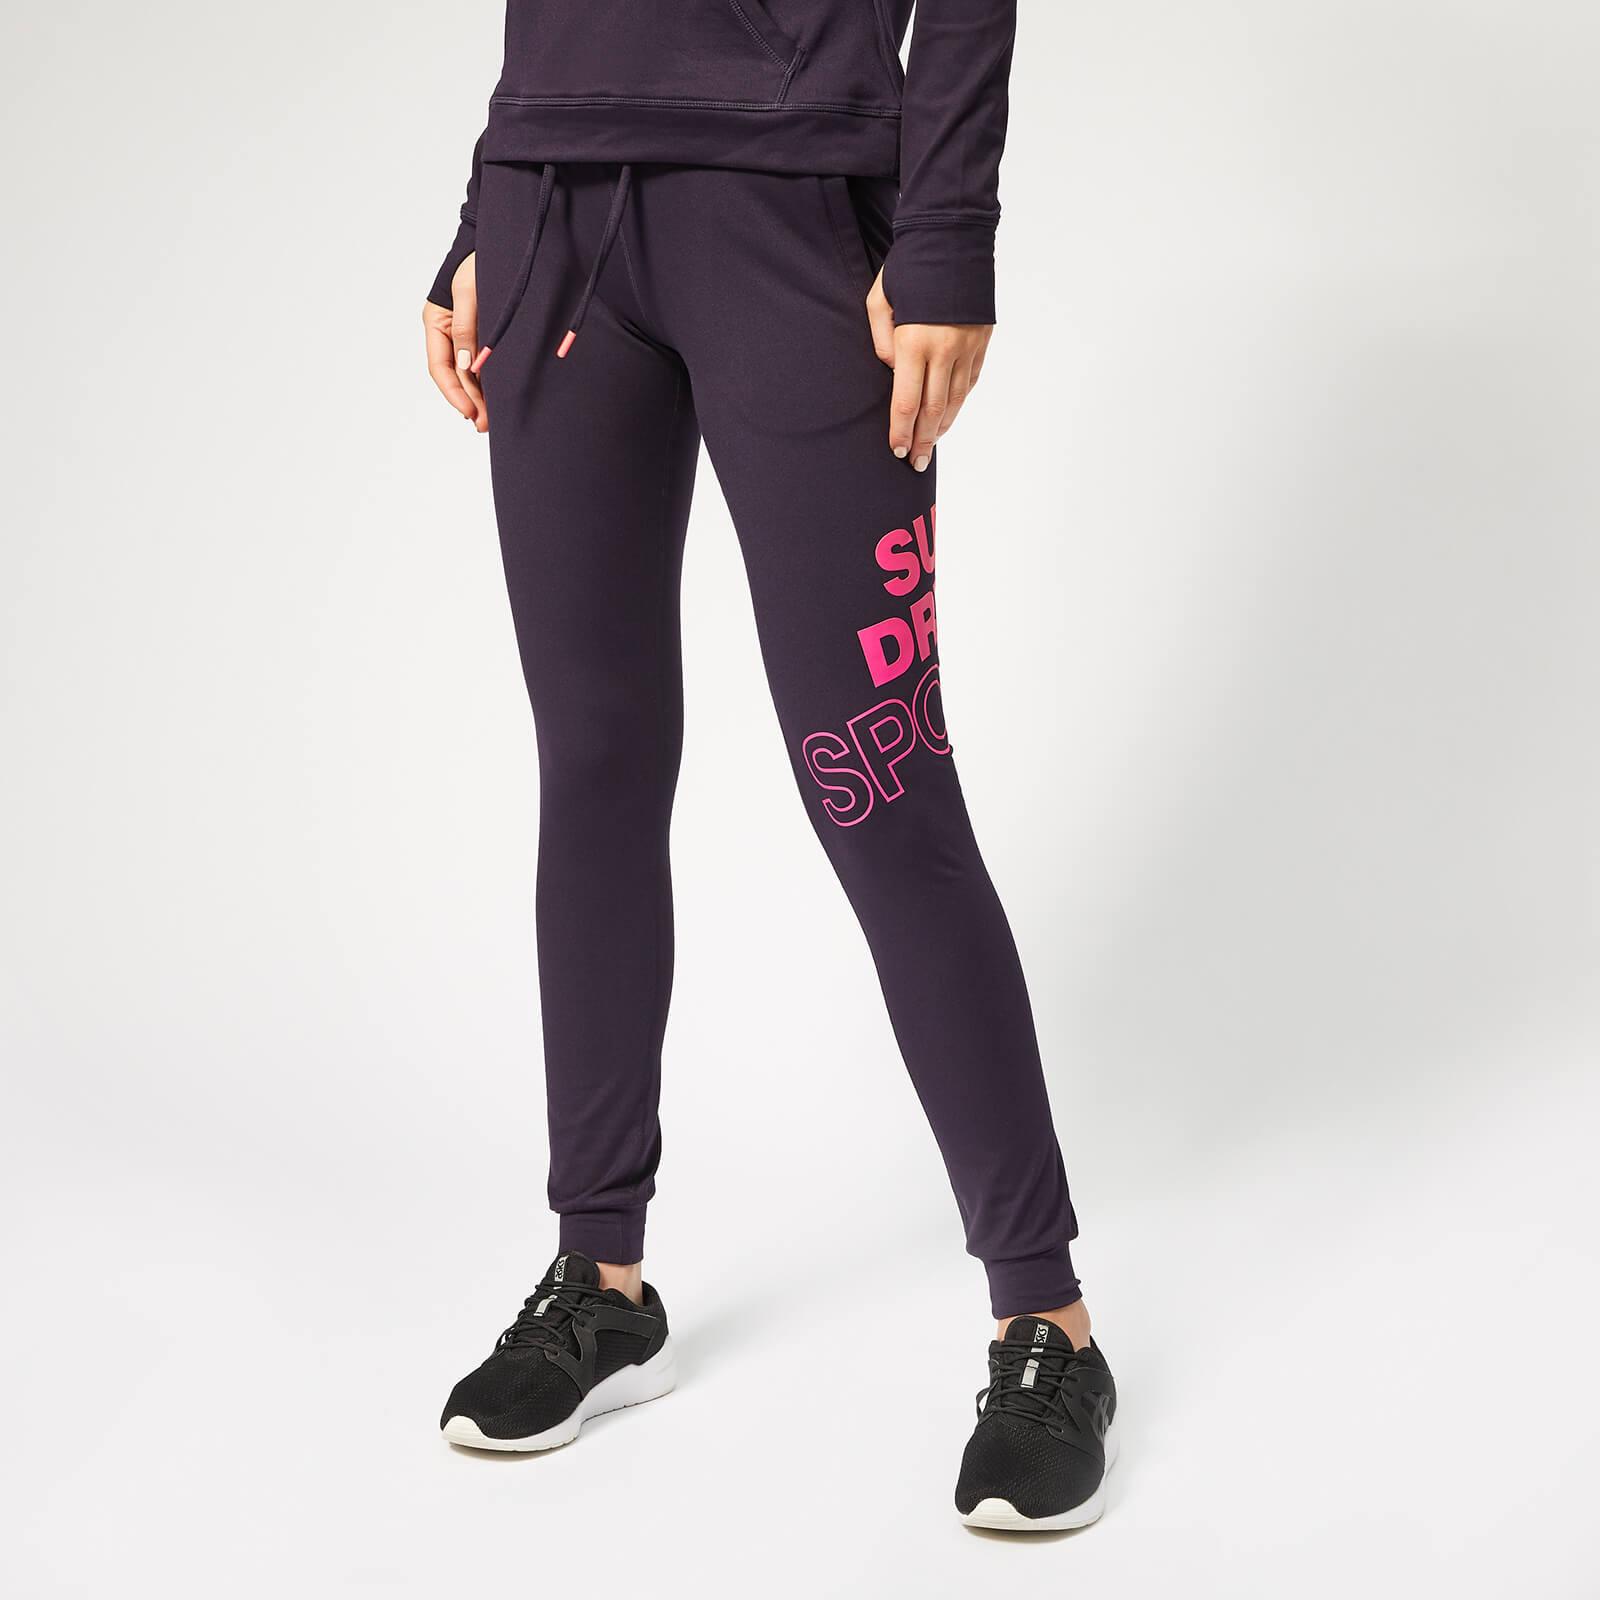 Superdry Sport Women's Core Graphic Joggers - Midnight Purple - UK 14 - Purple